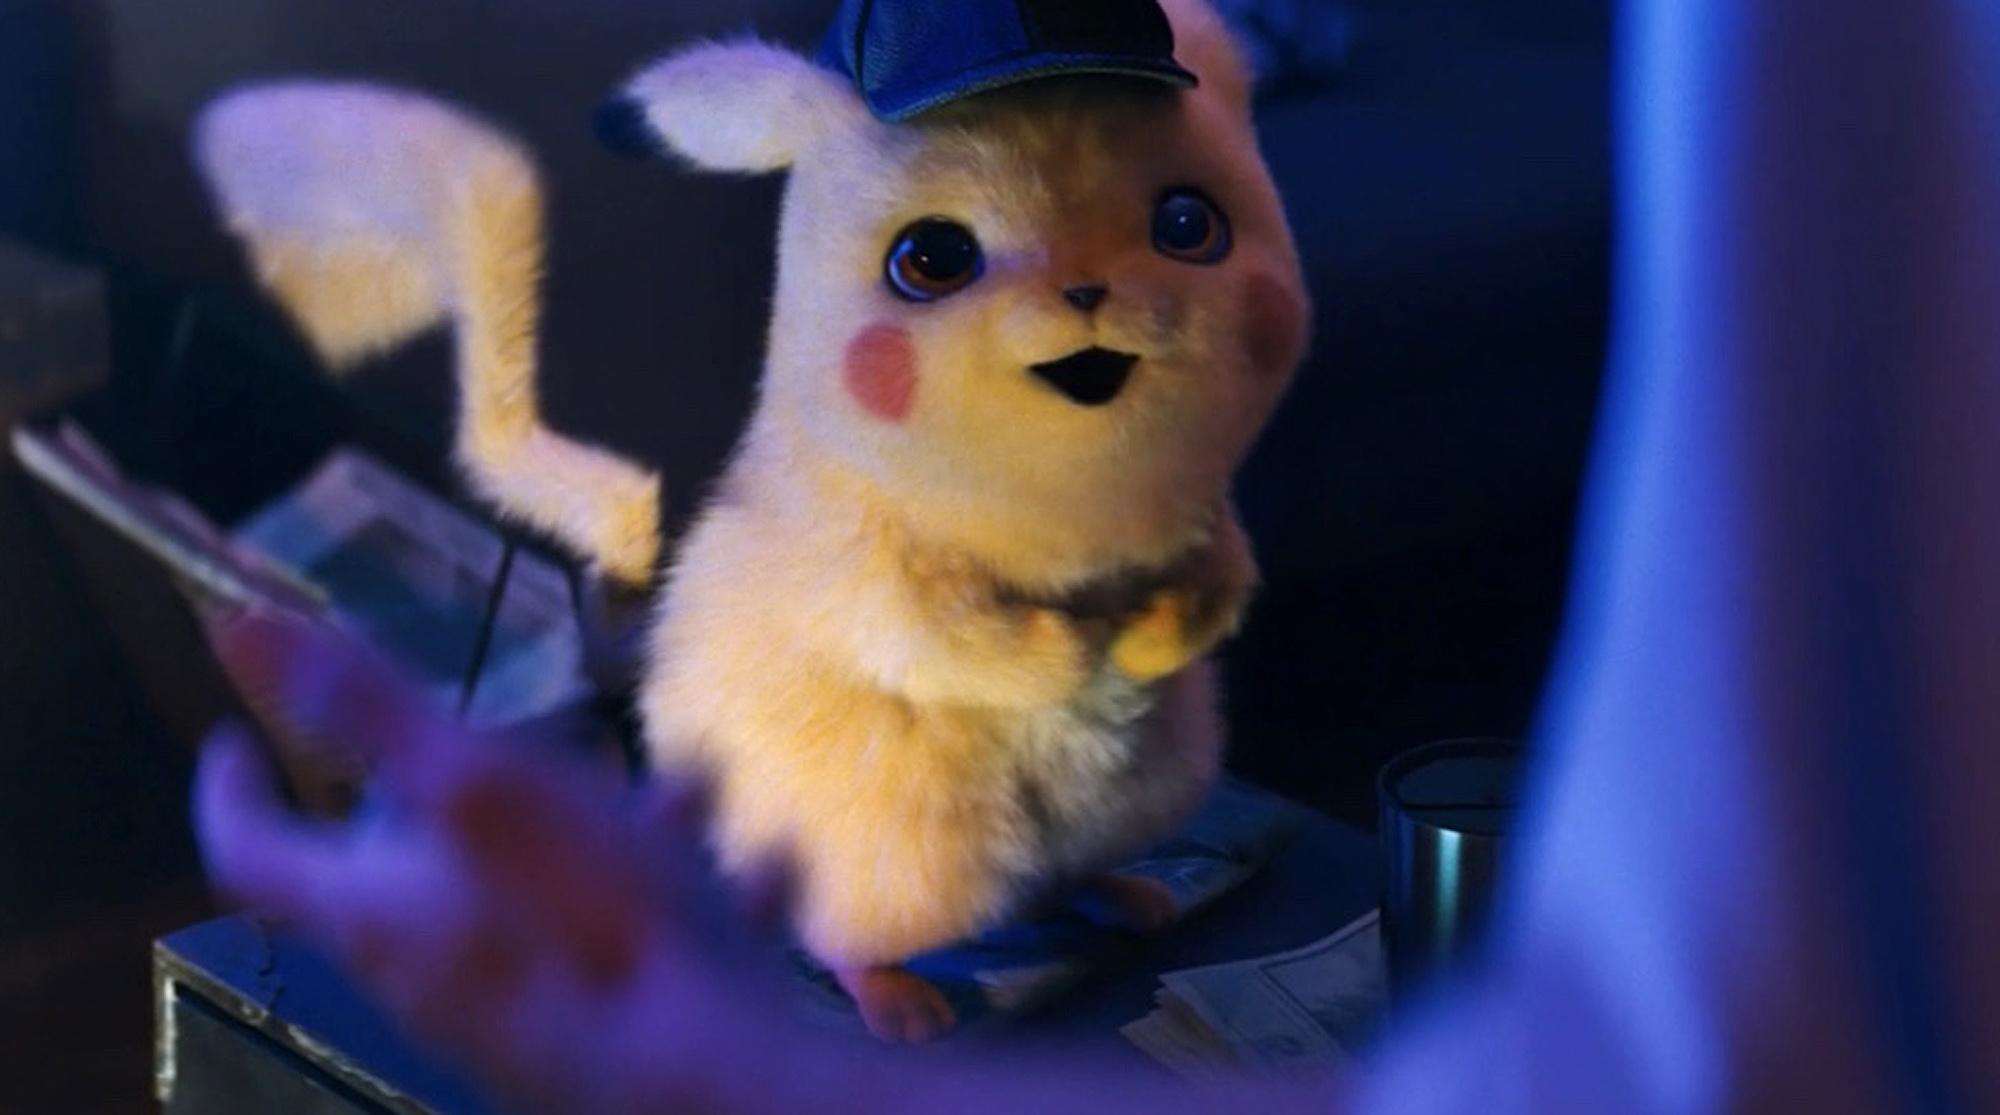 pikachu-detective-1-2000